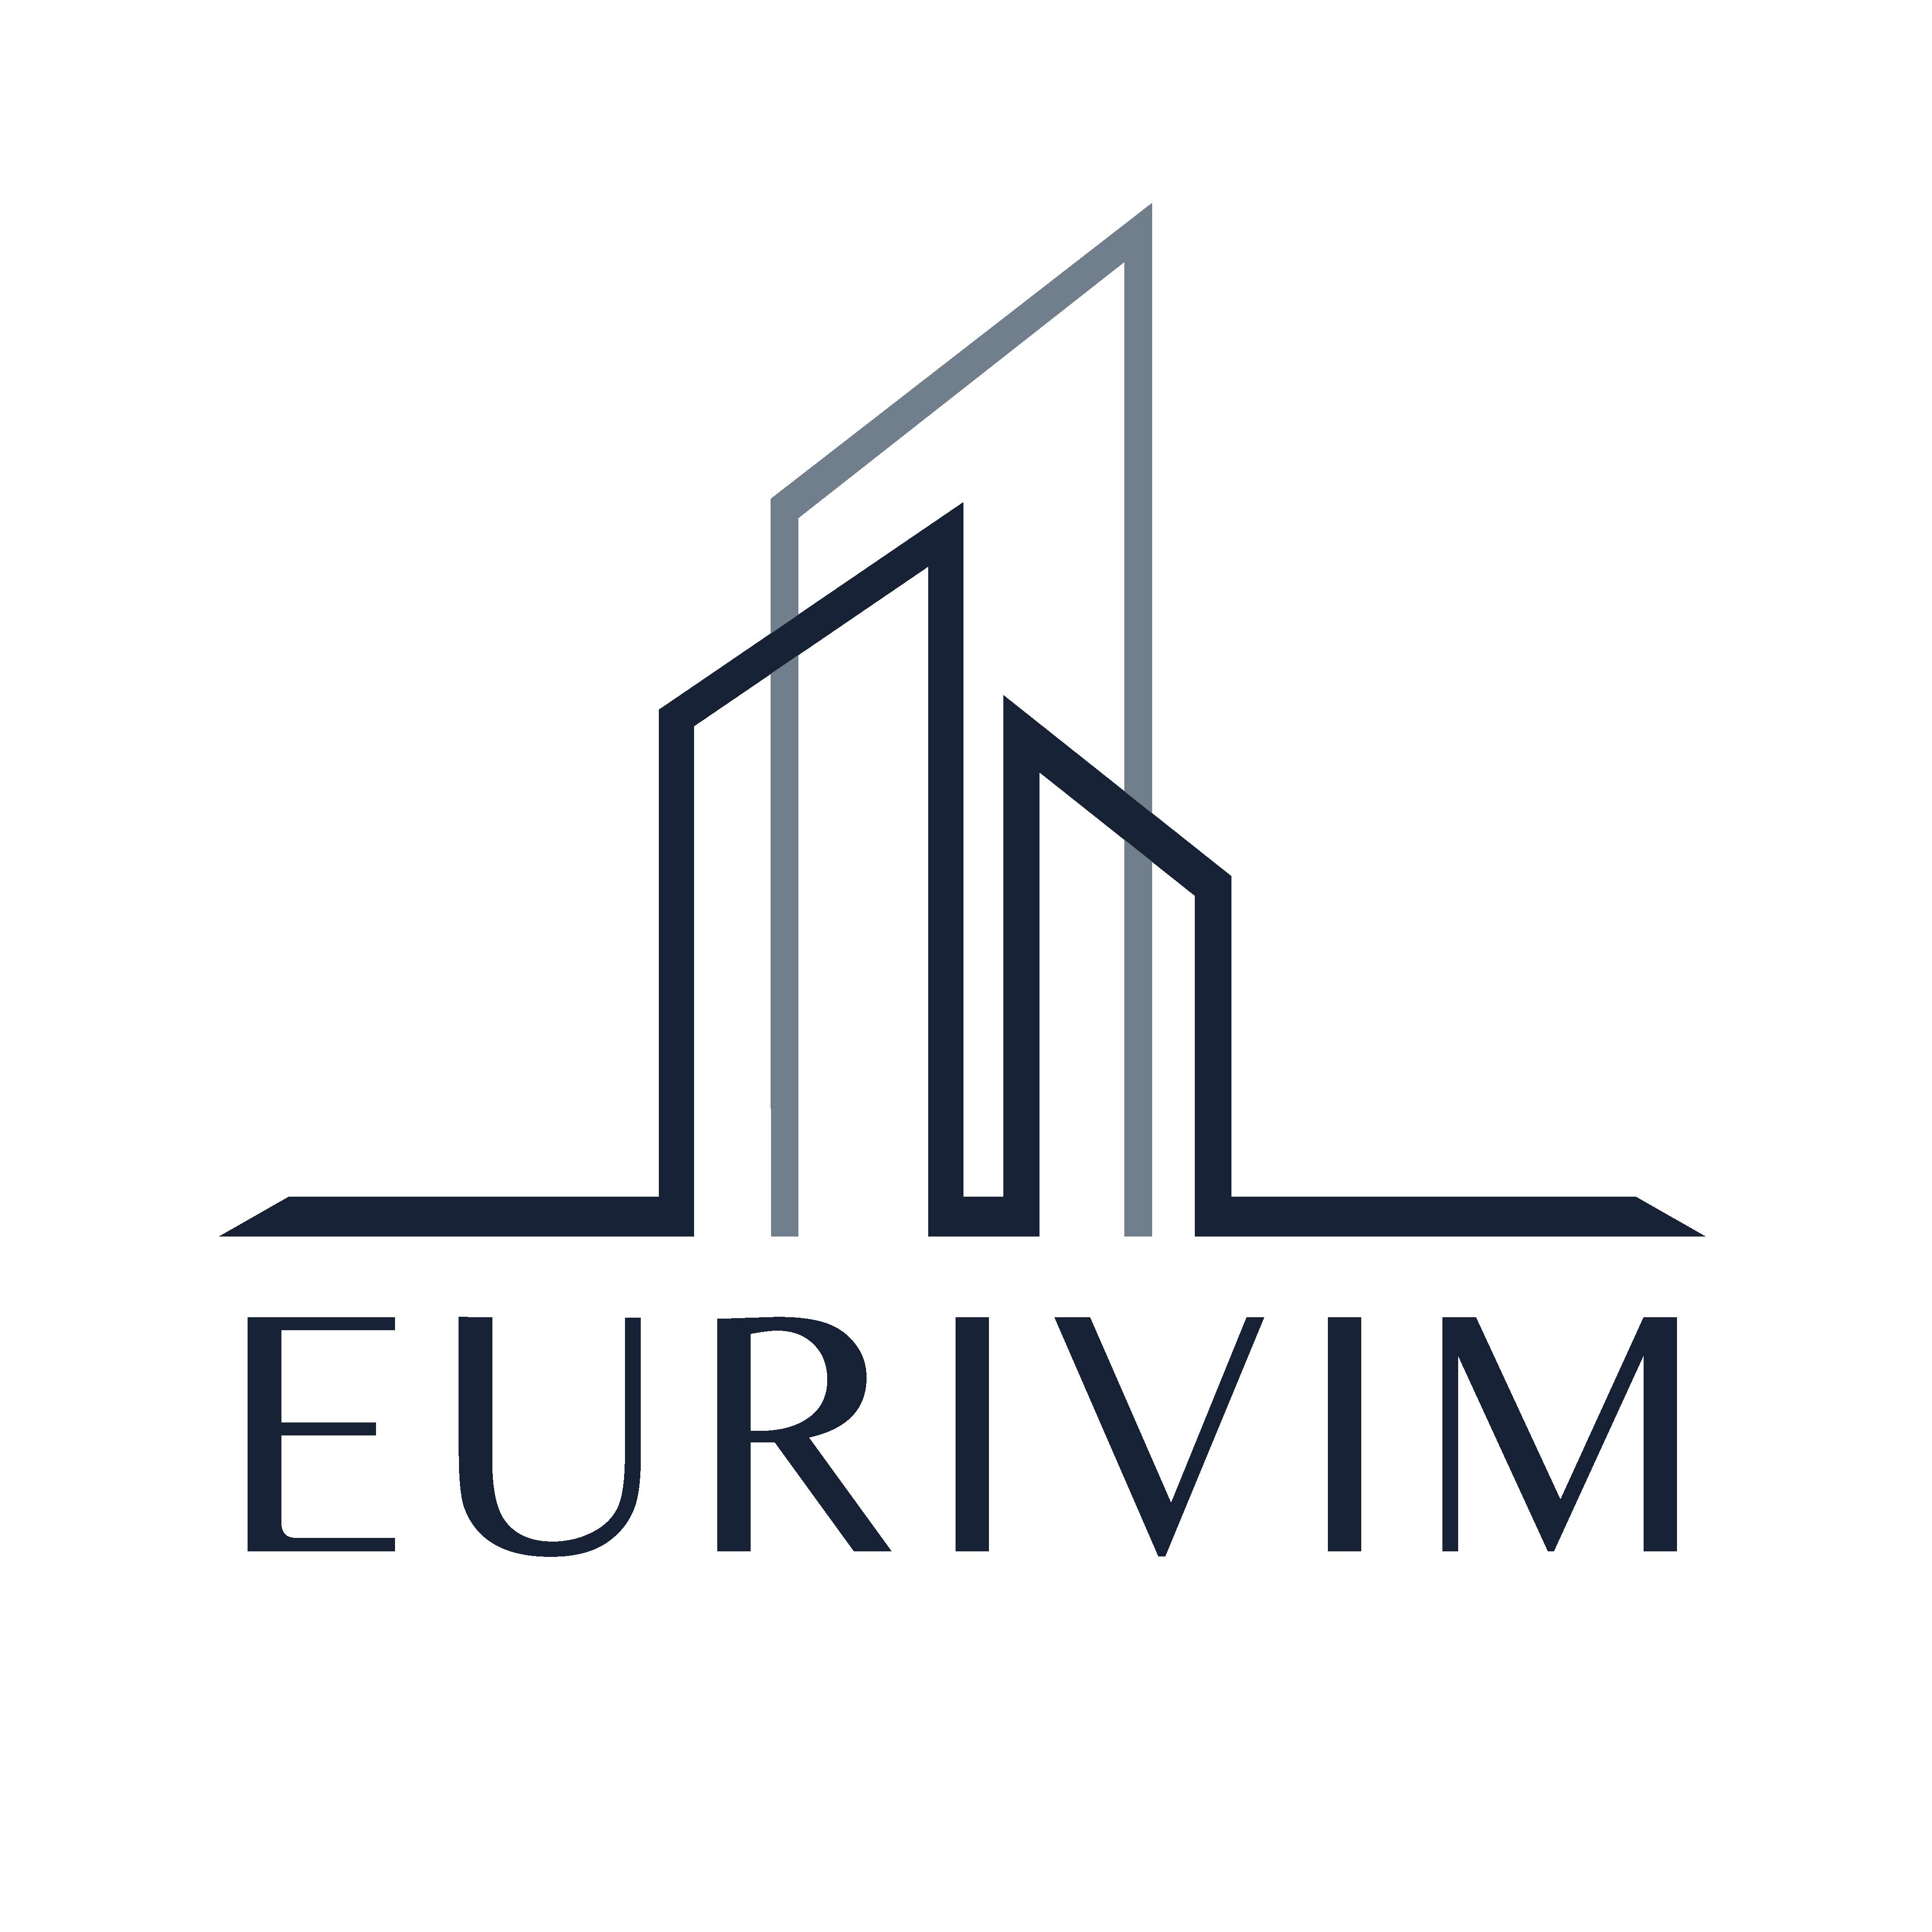 Eurivim